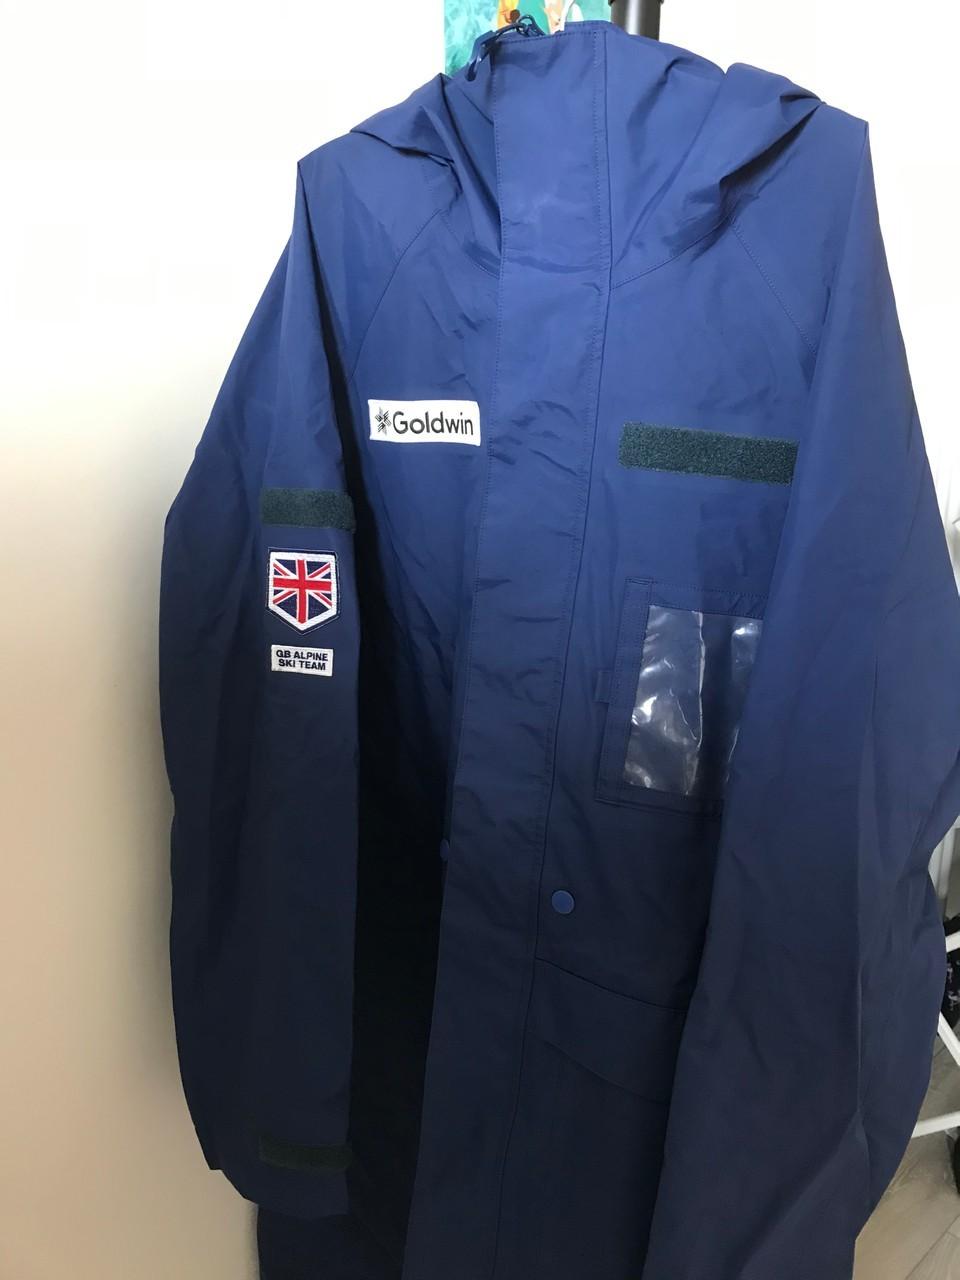 Goldwin Team GB Long Rain Jacket